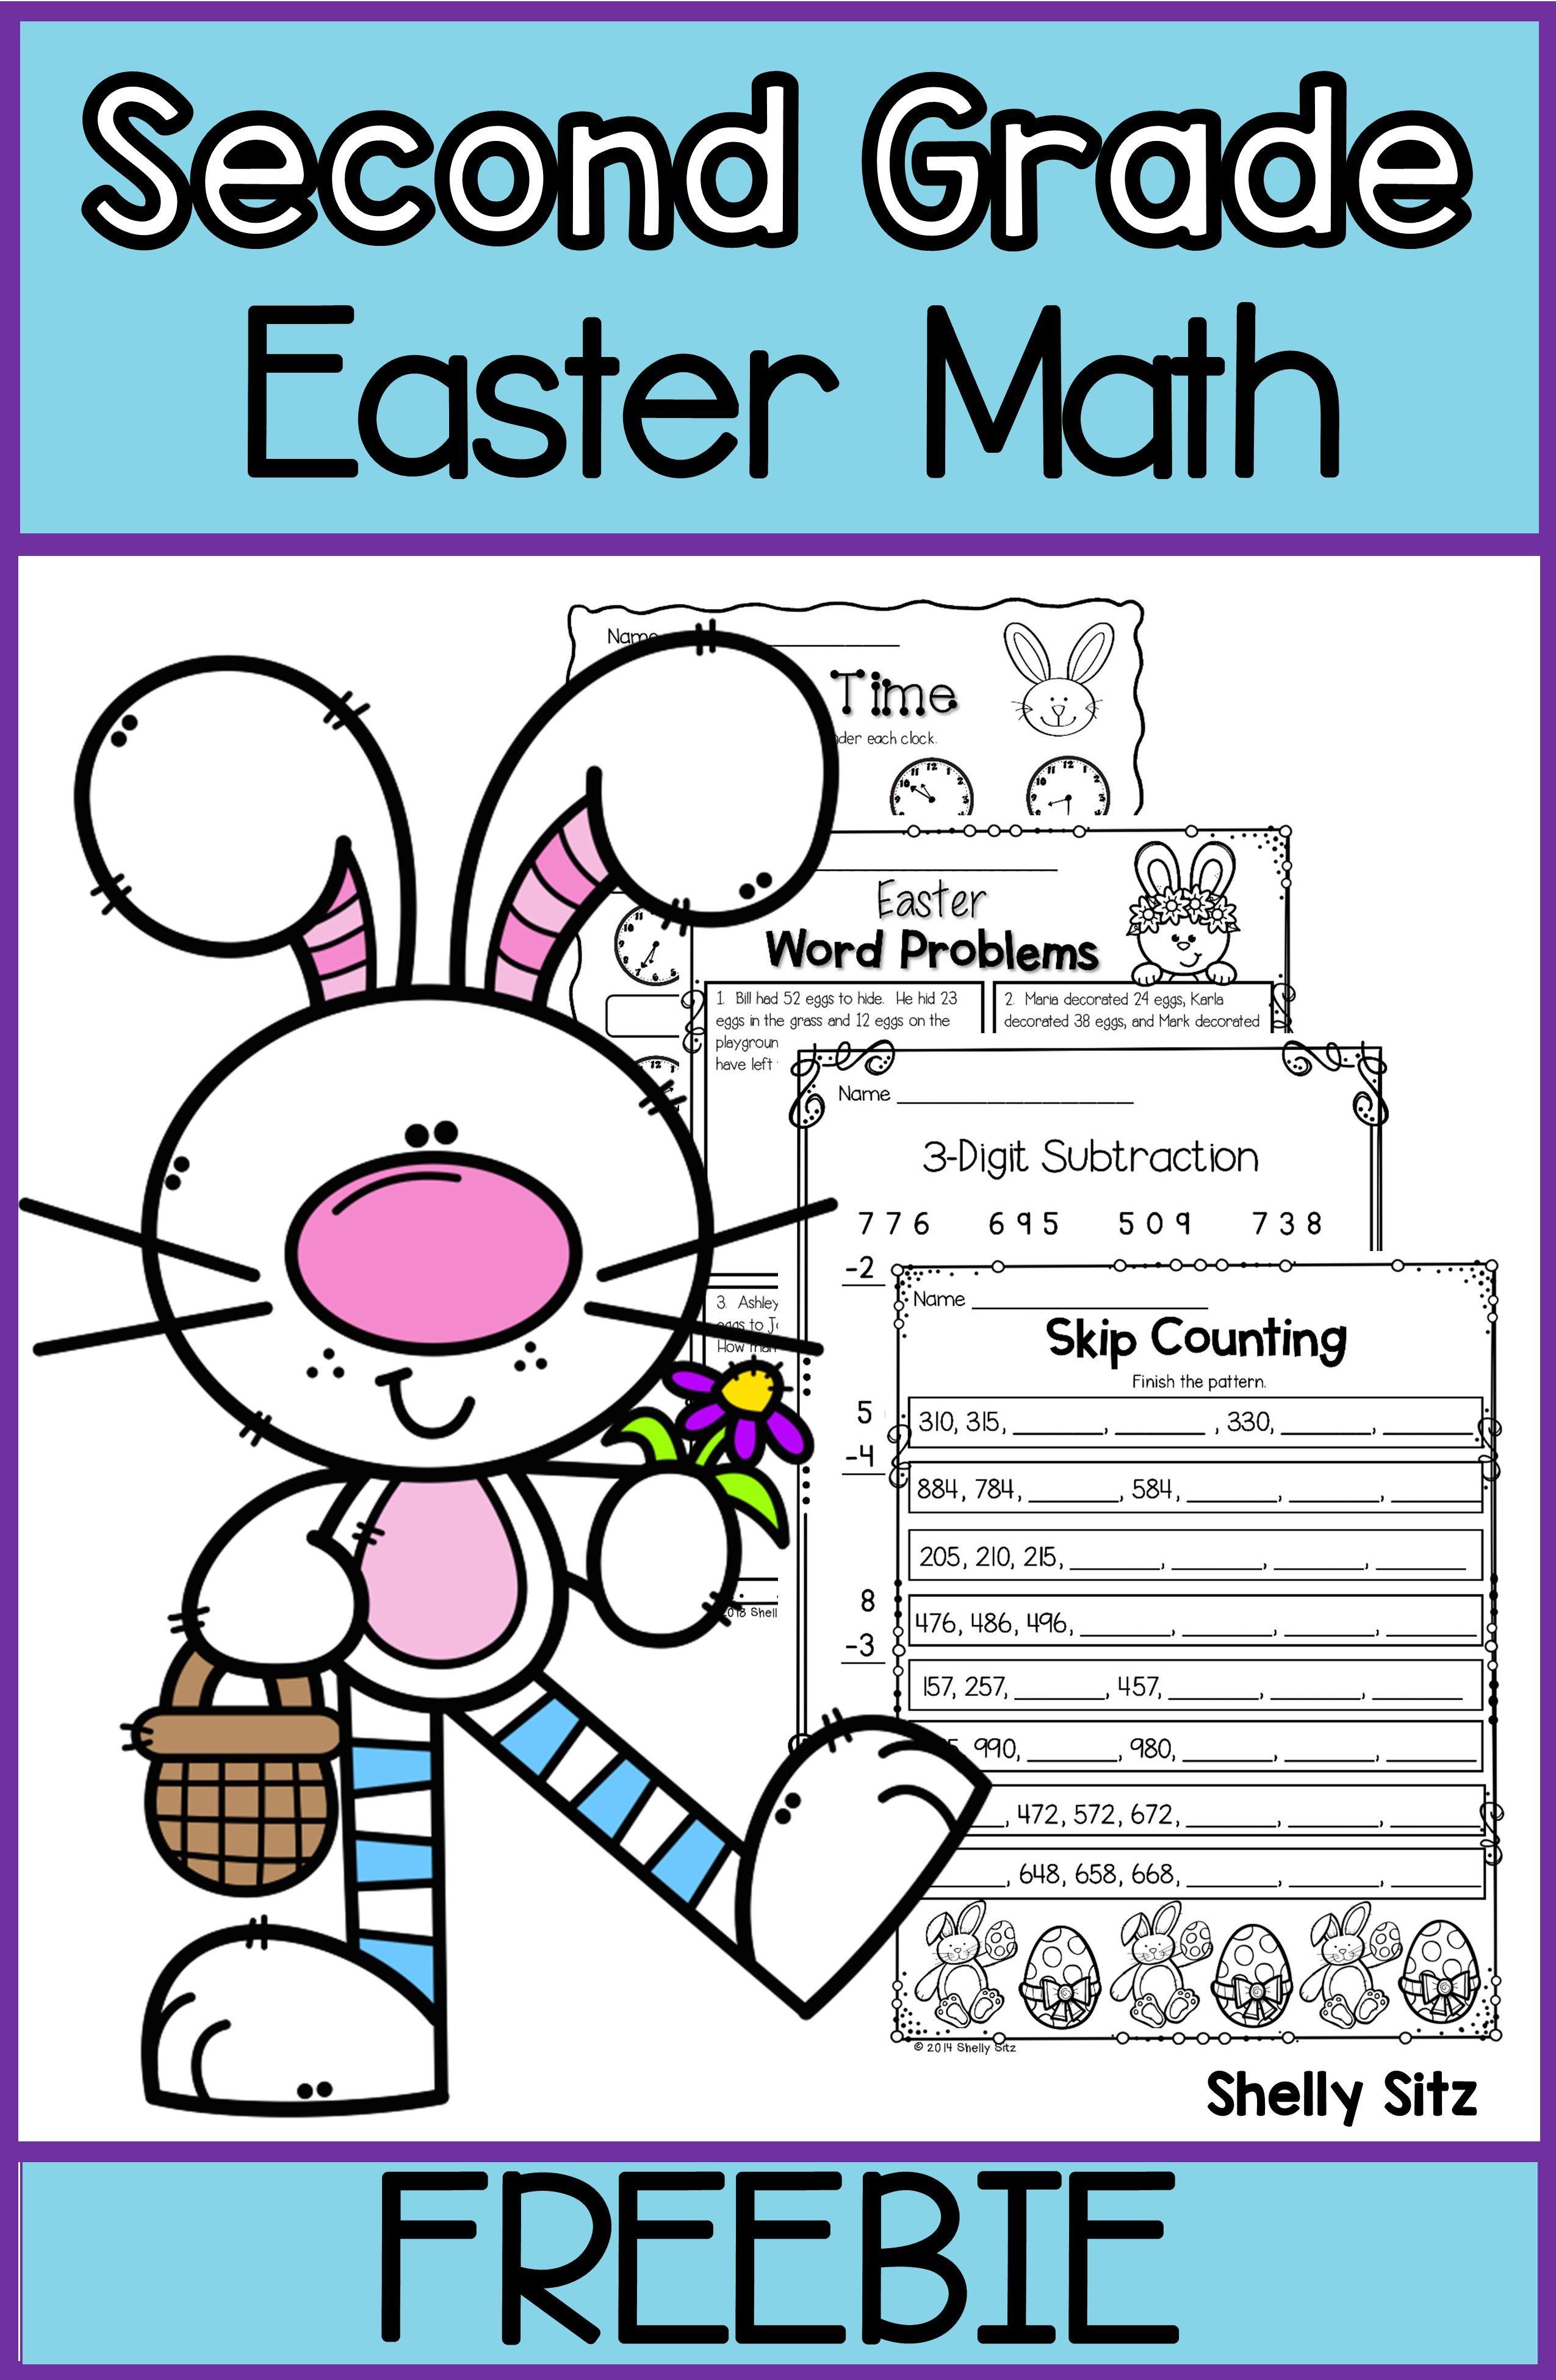 medium resolution of Easter Math for Second Grade   Easter math